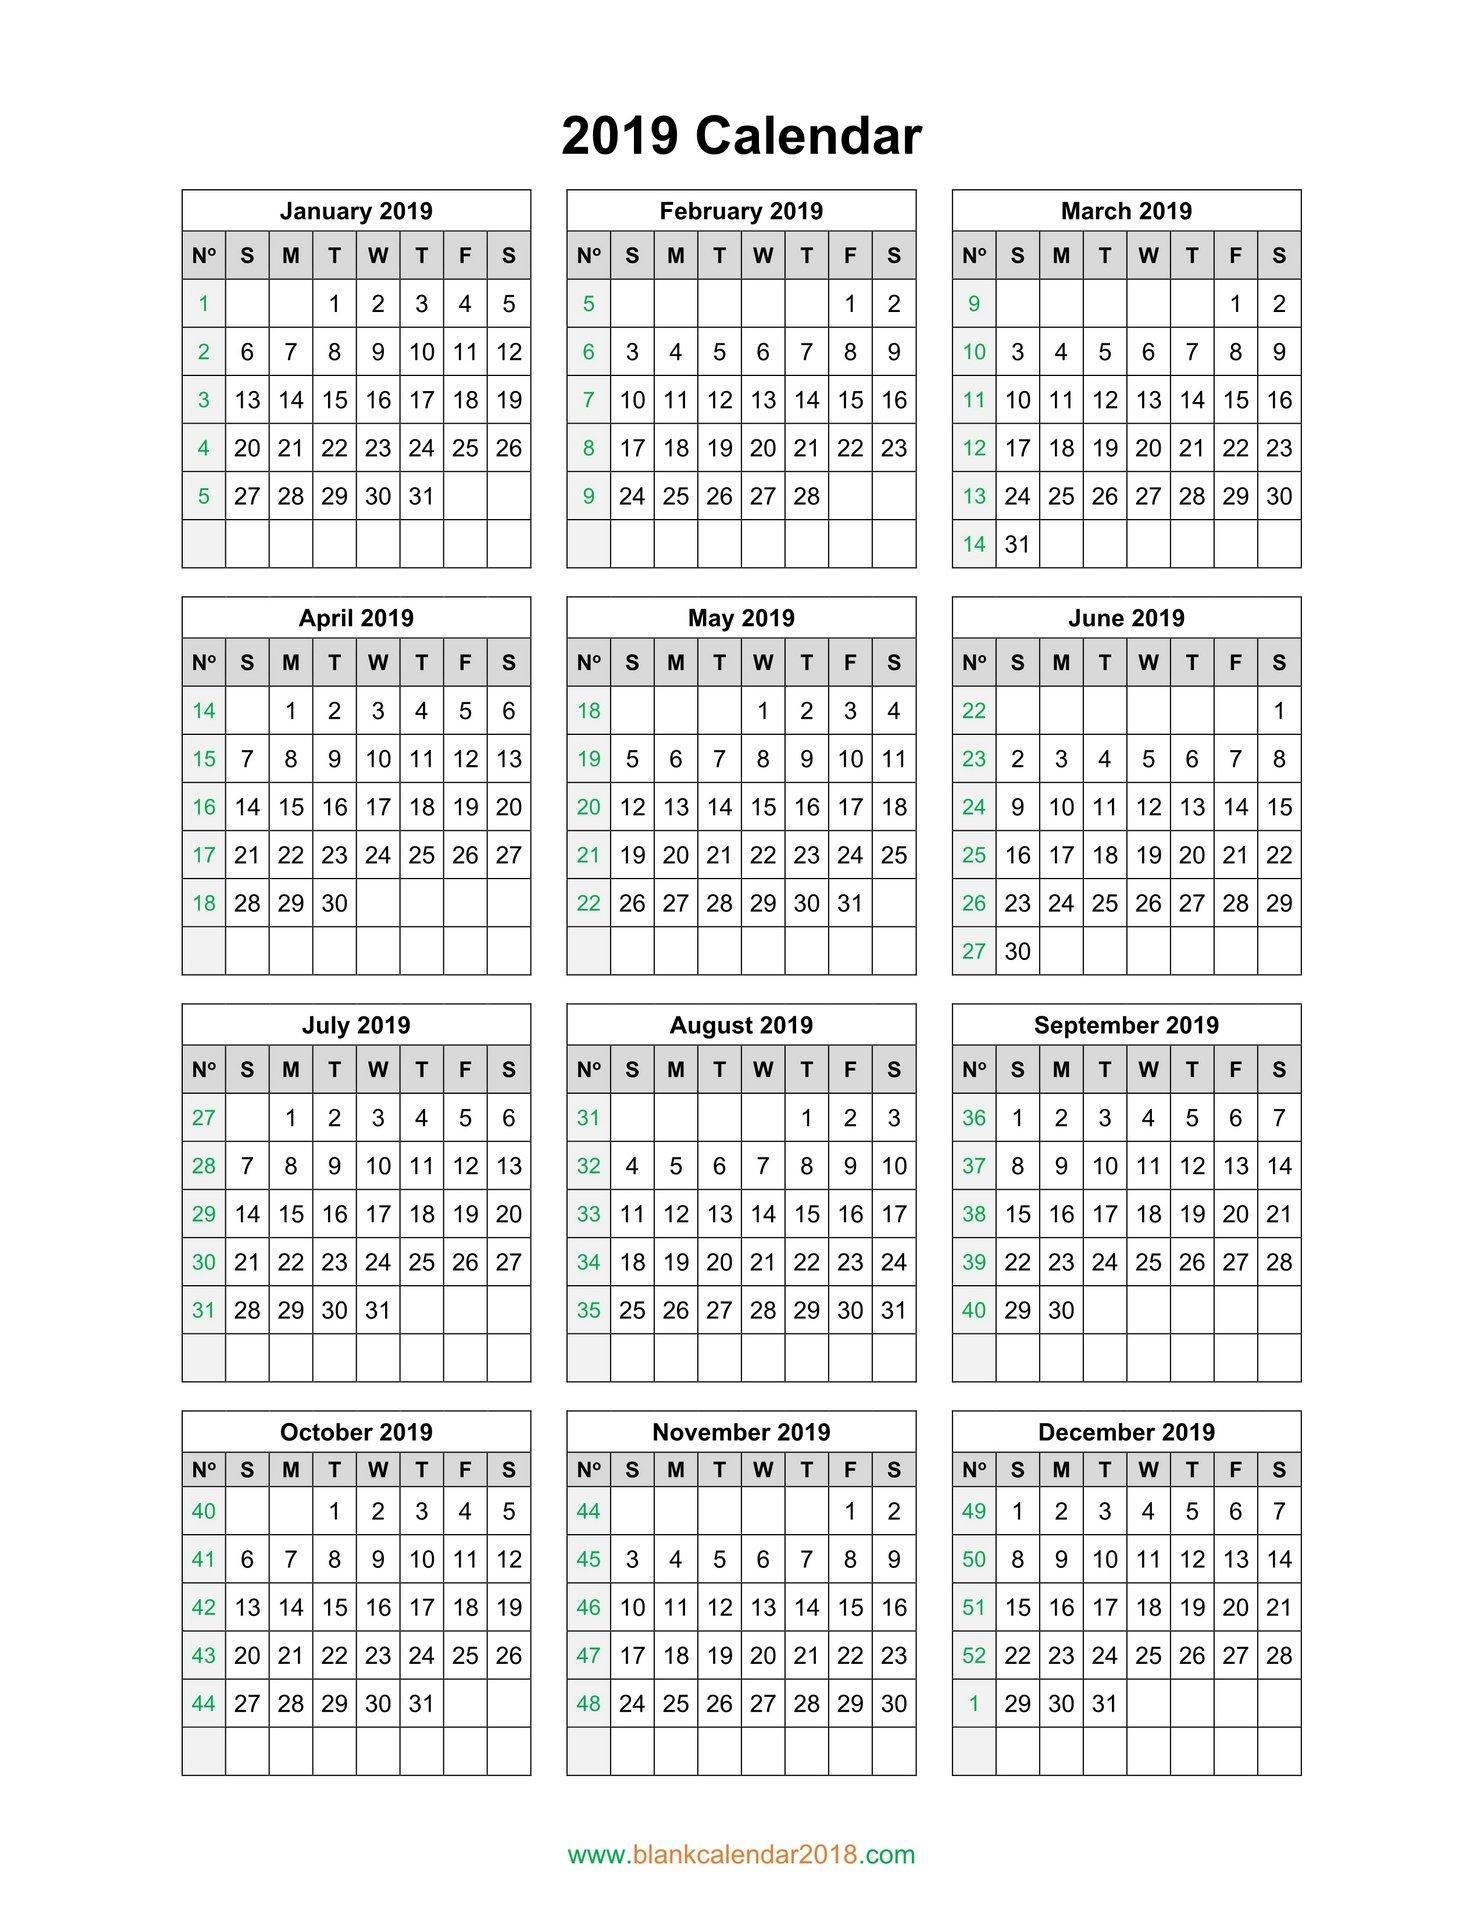 Blank Calendar 2019 Calendar 0F 2019